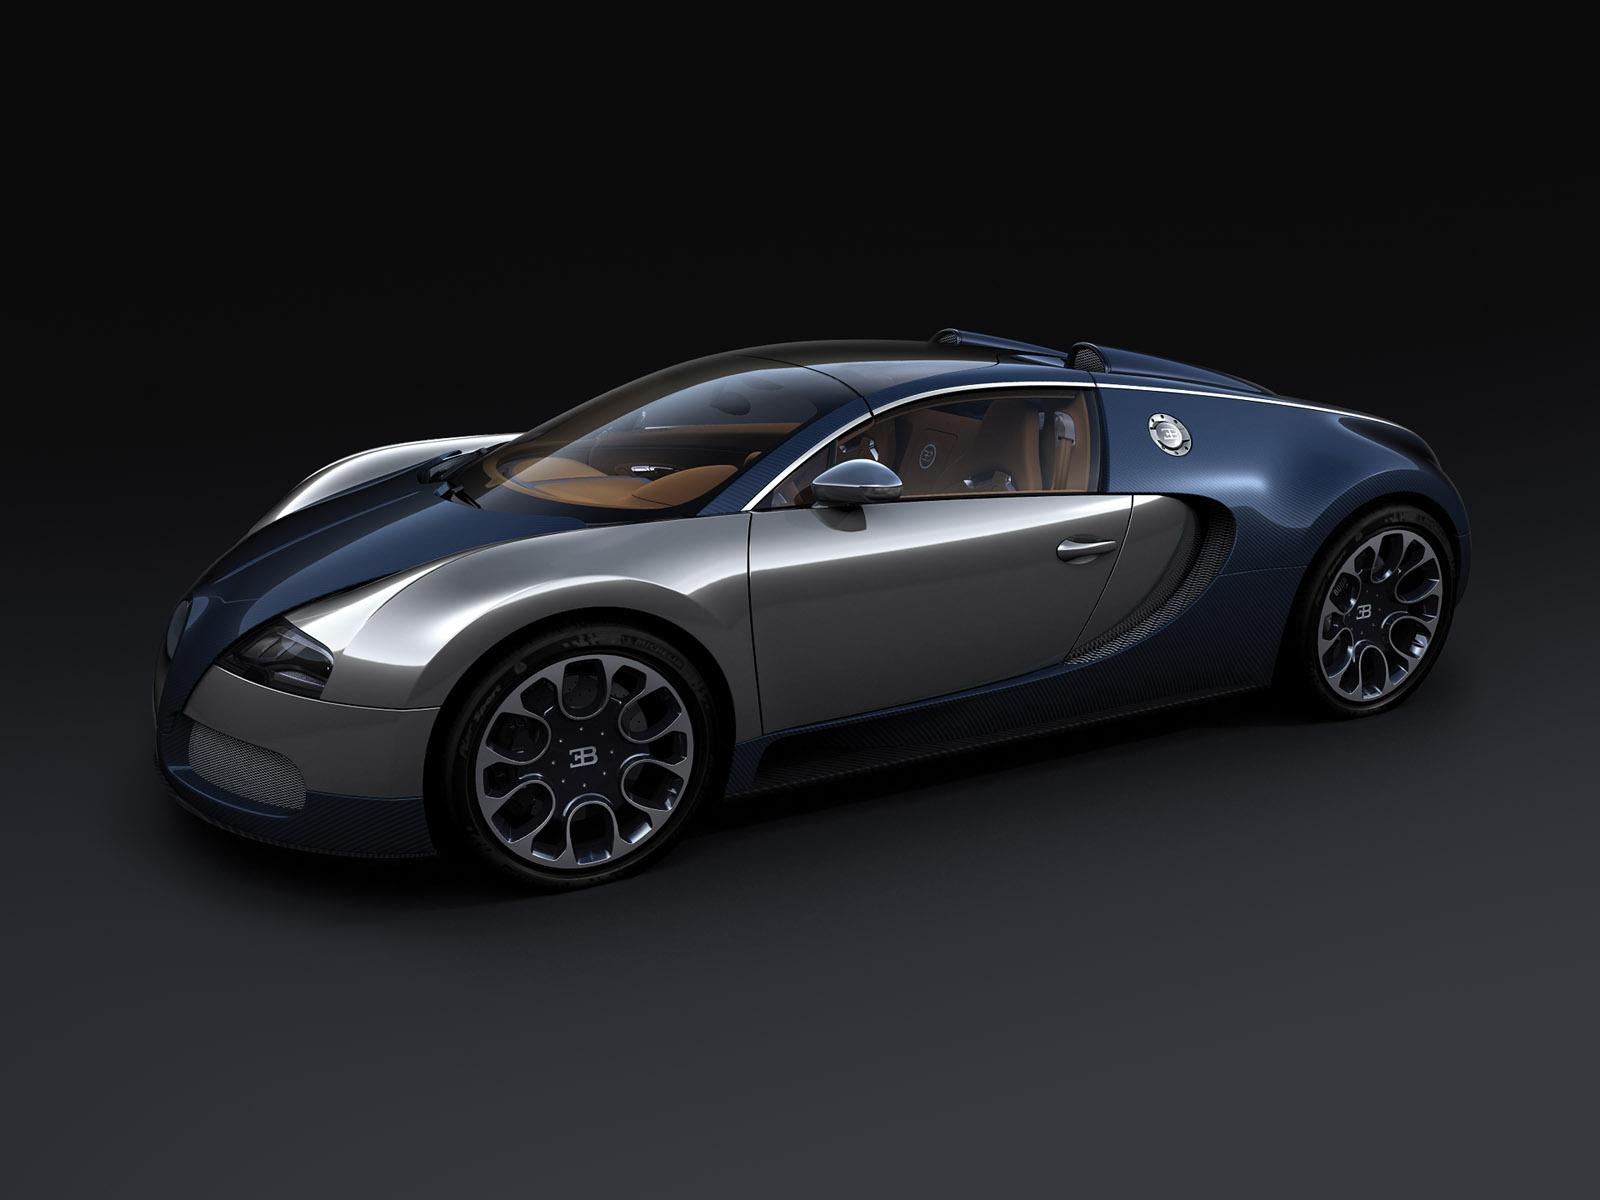 bugatti-sang-bleu-grand-sport-revealed-9880_1 Gorgeous Bugatti Veyron Grand Sport Vitesse Bleu Cars Trend